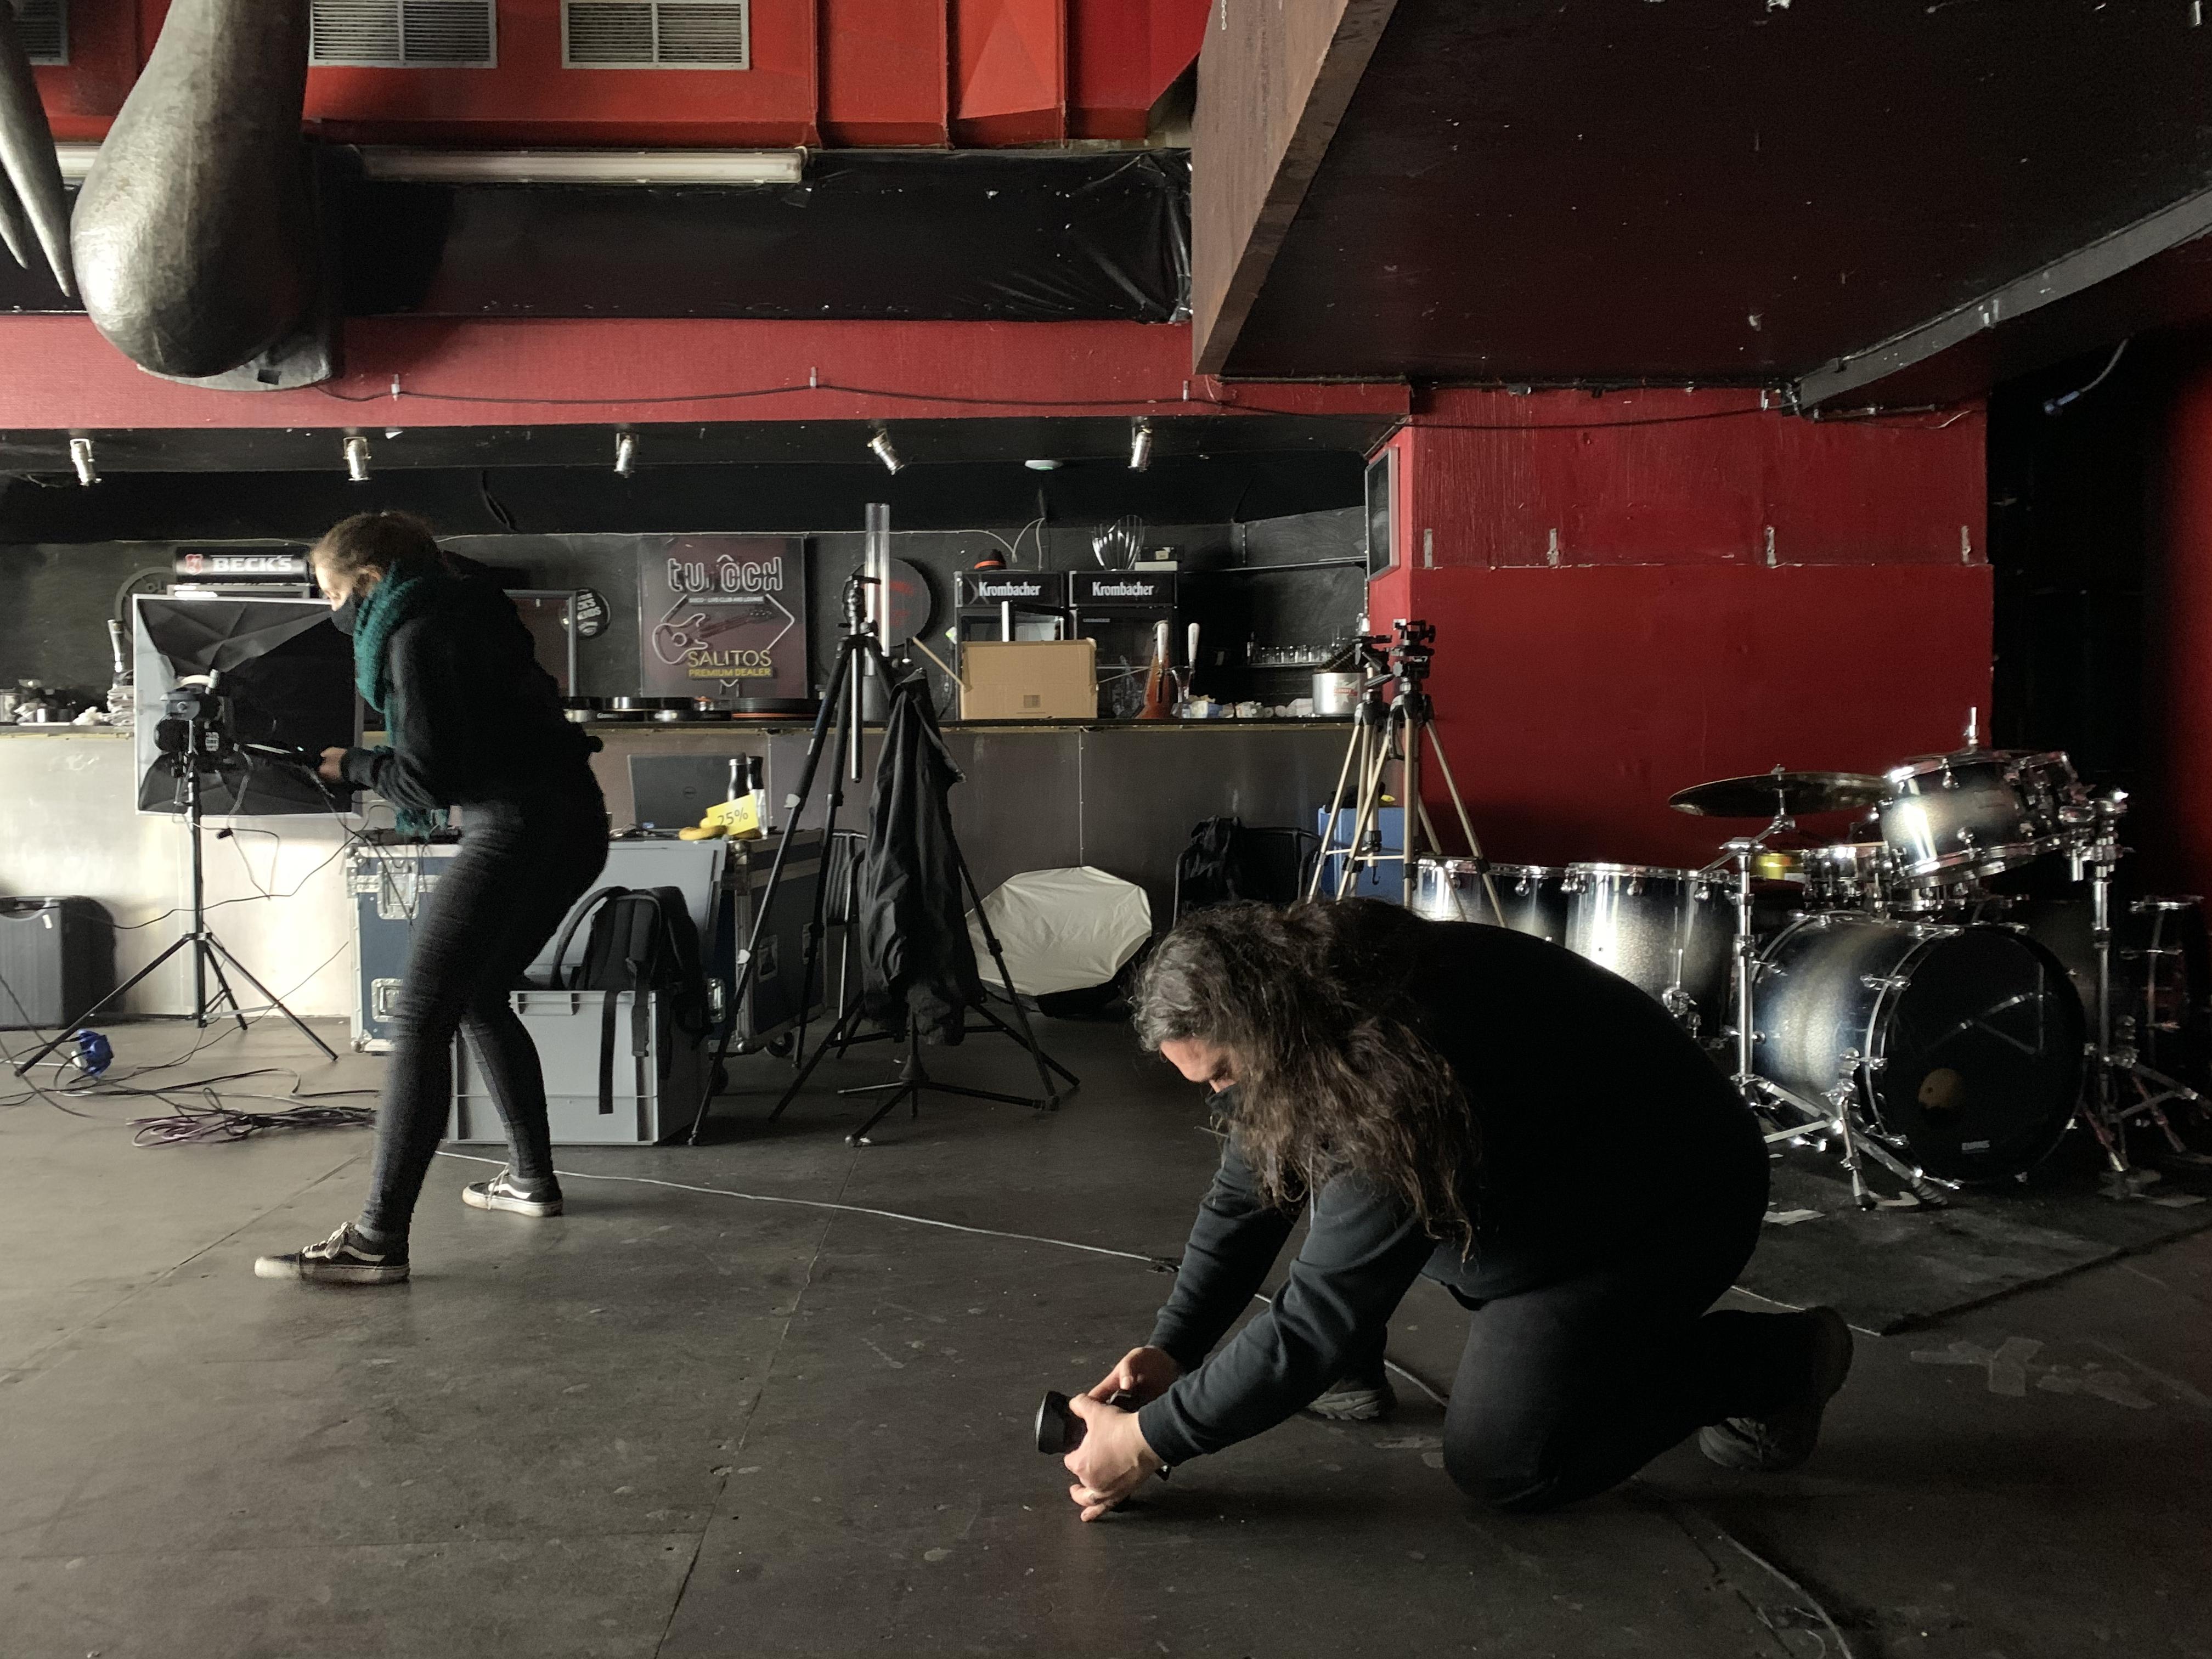 The-Very-End-Metal-Video-Shoot-behind-the-scenes_5562